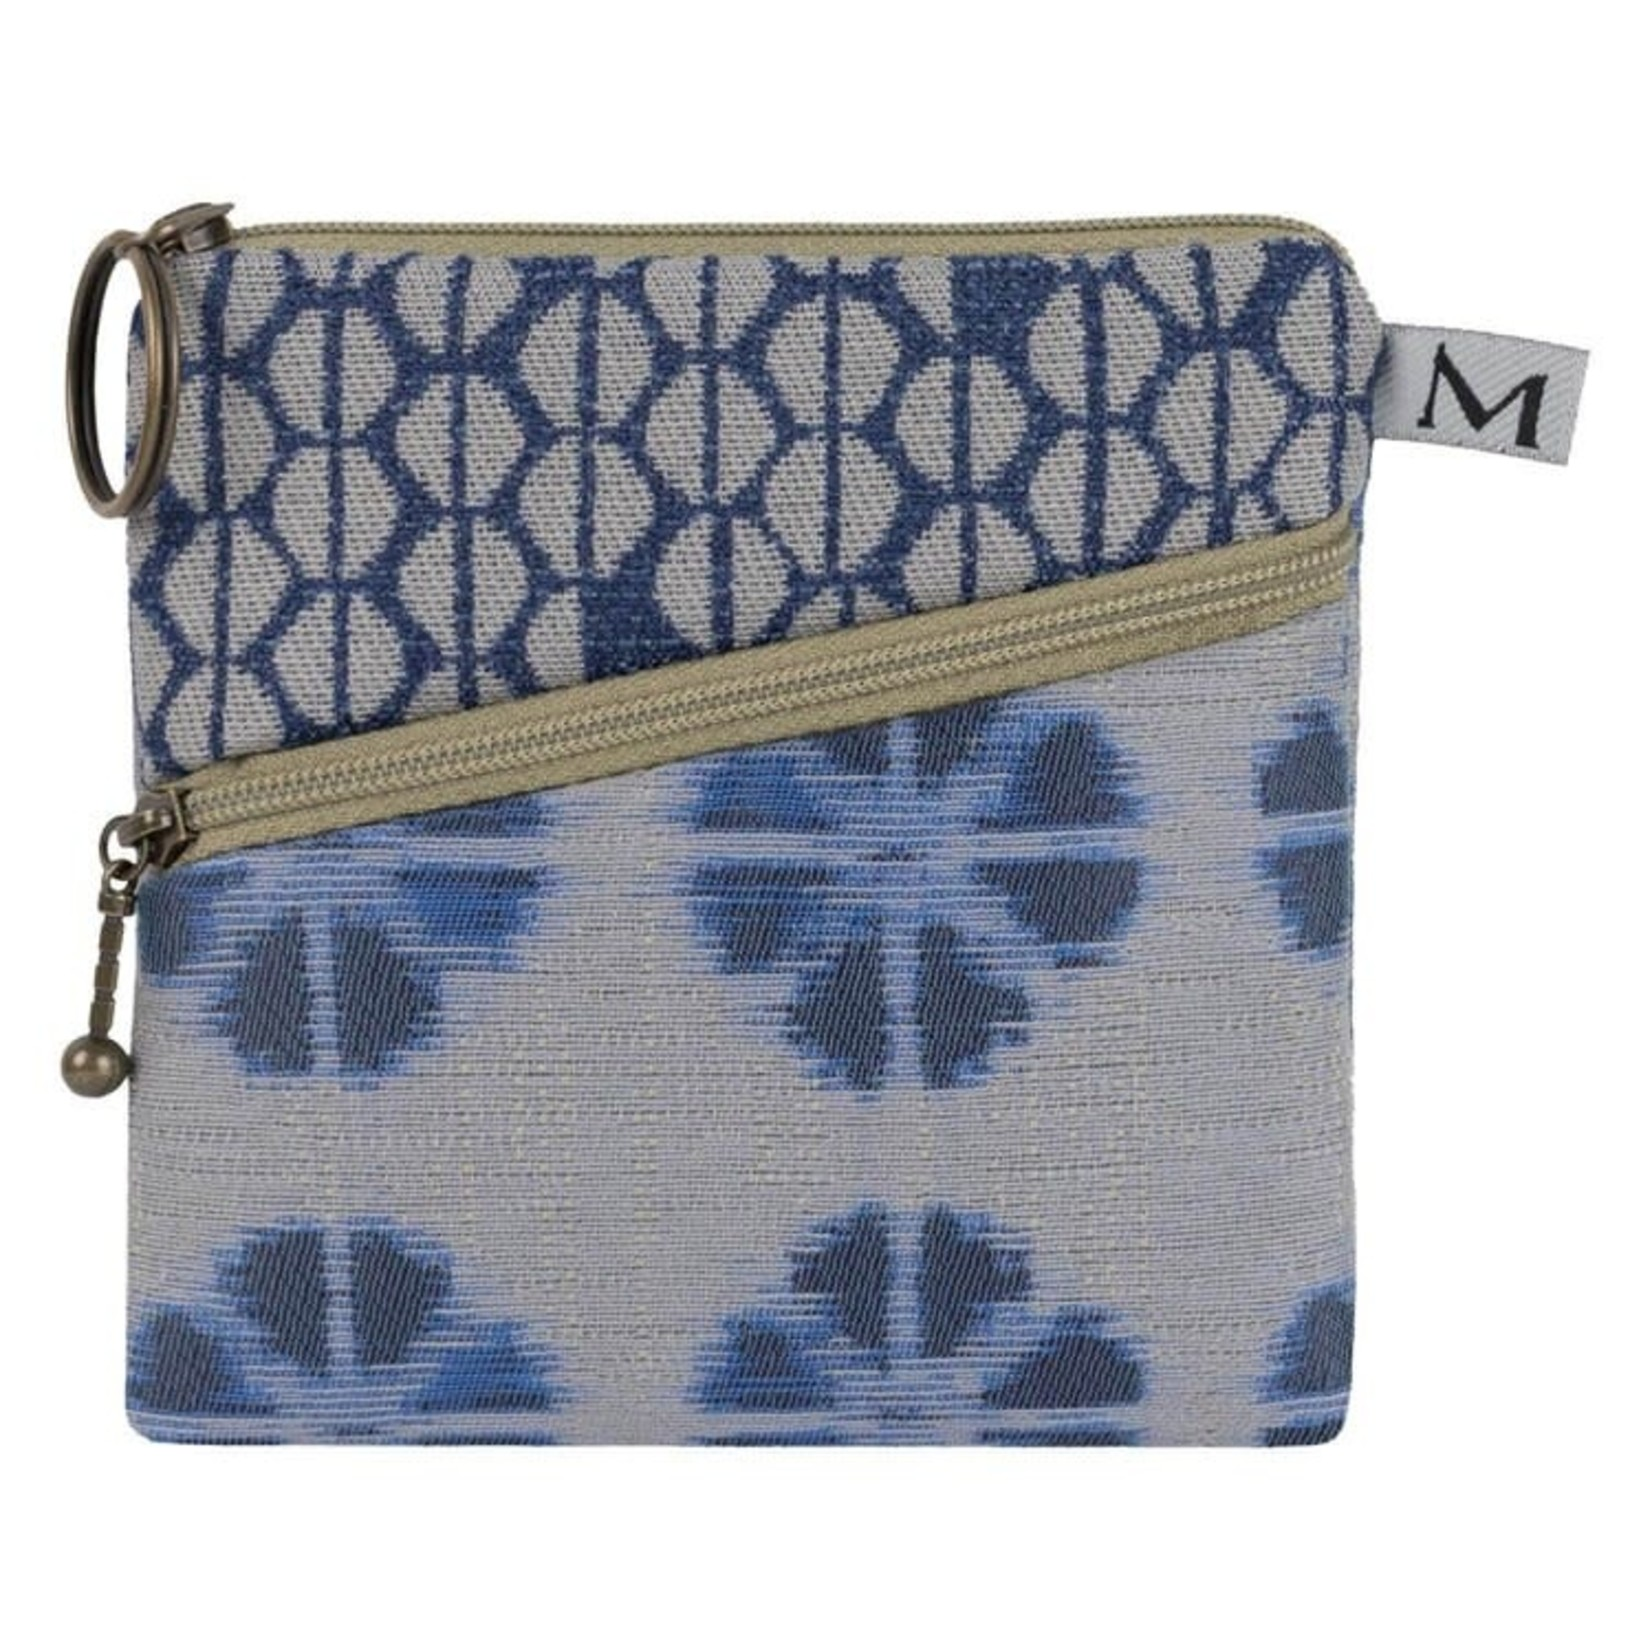 Maruca Design Maruca Roo Pouch in